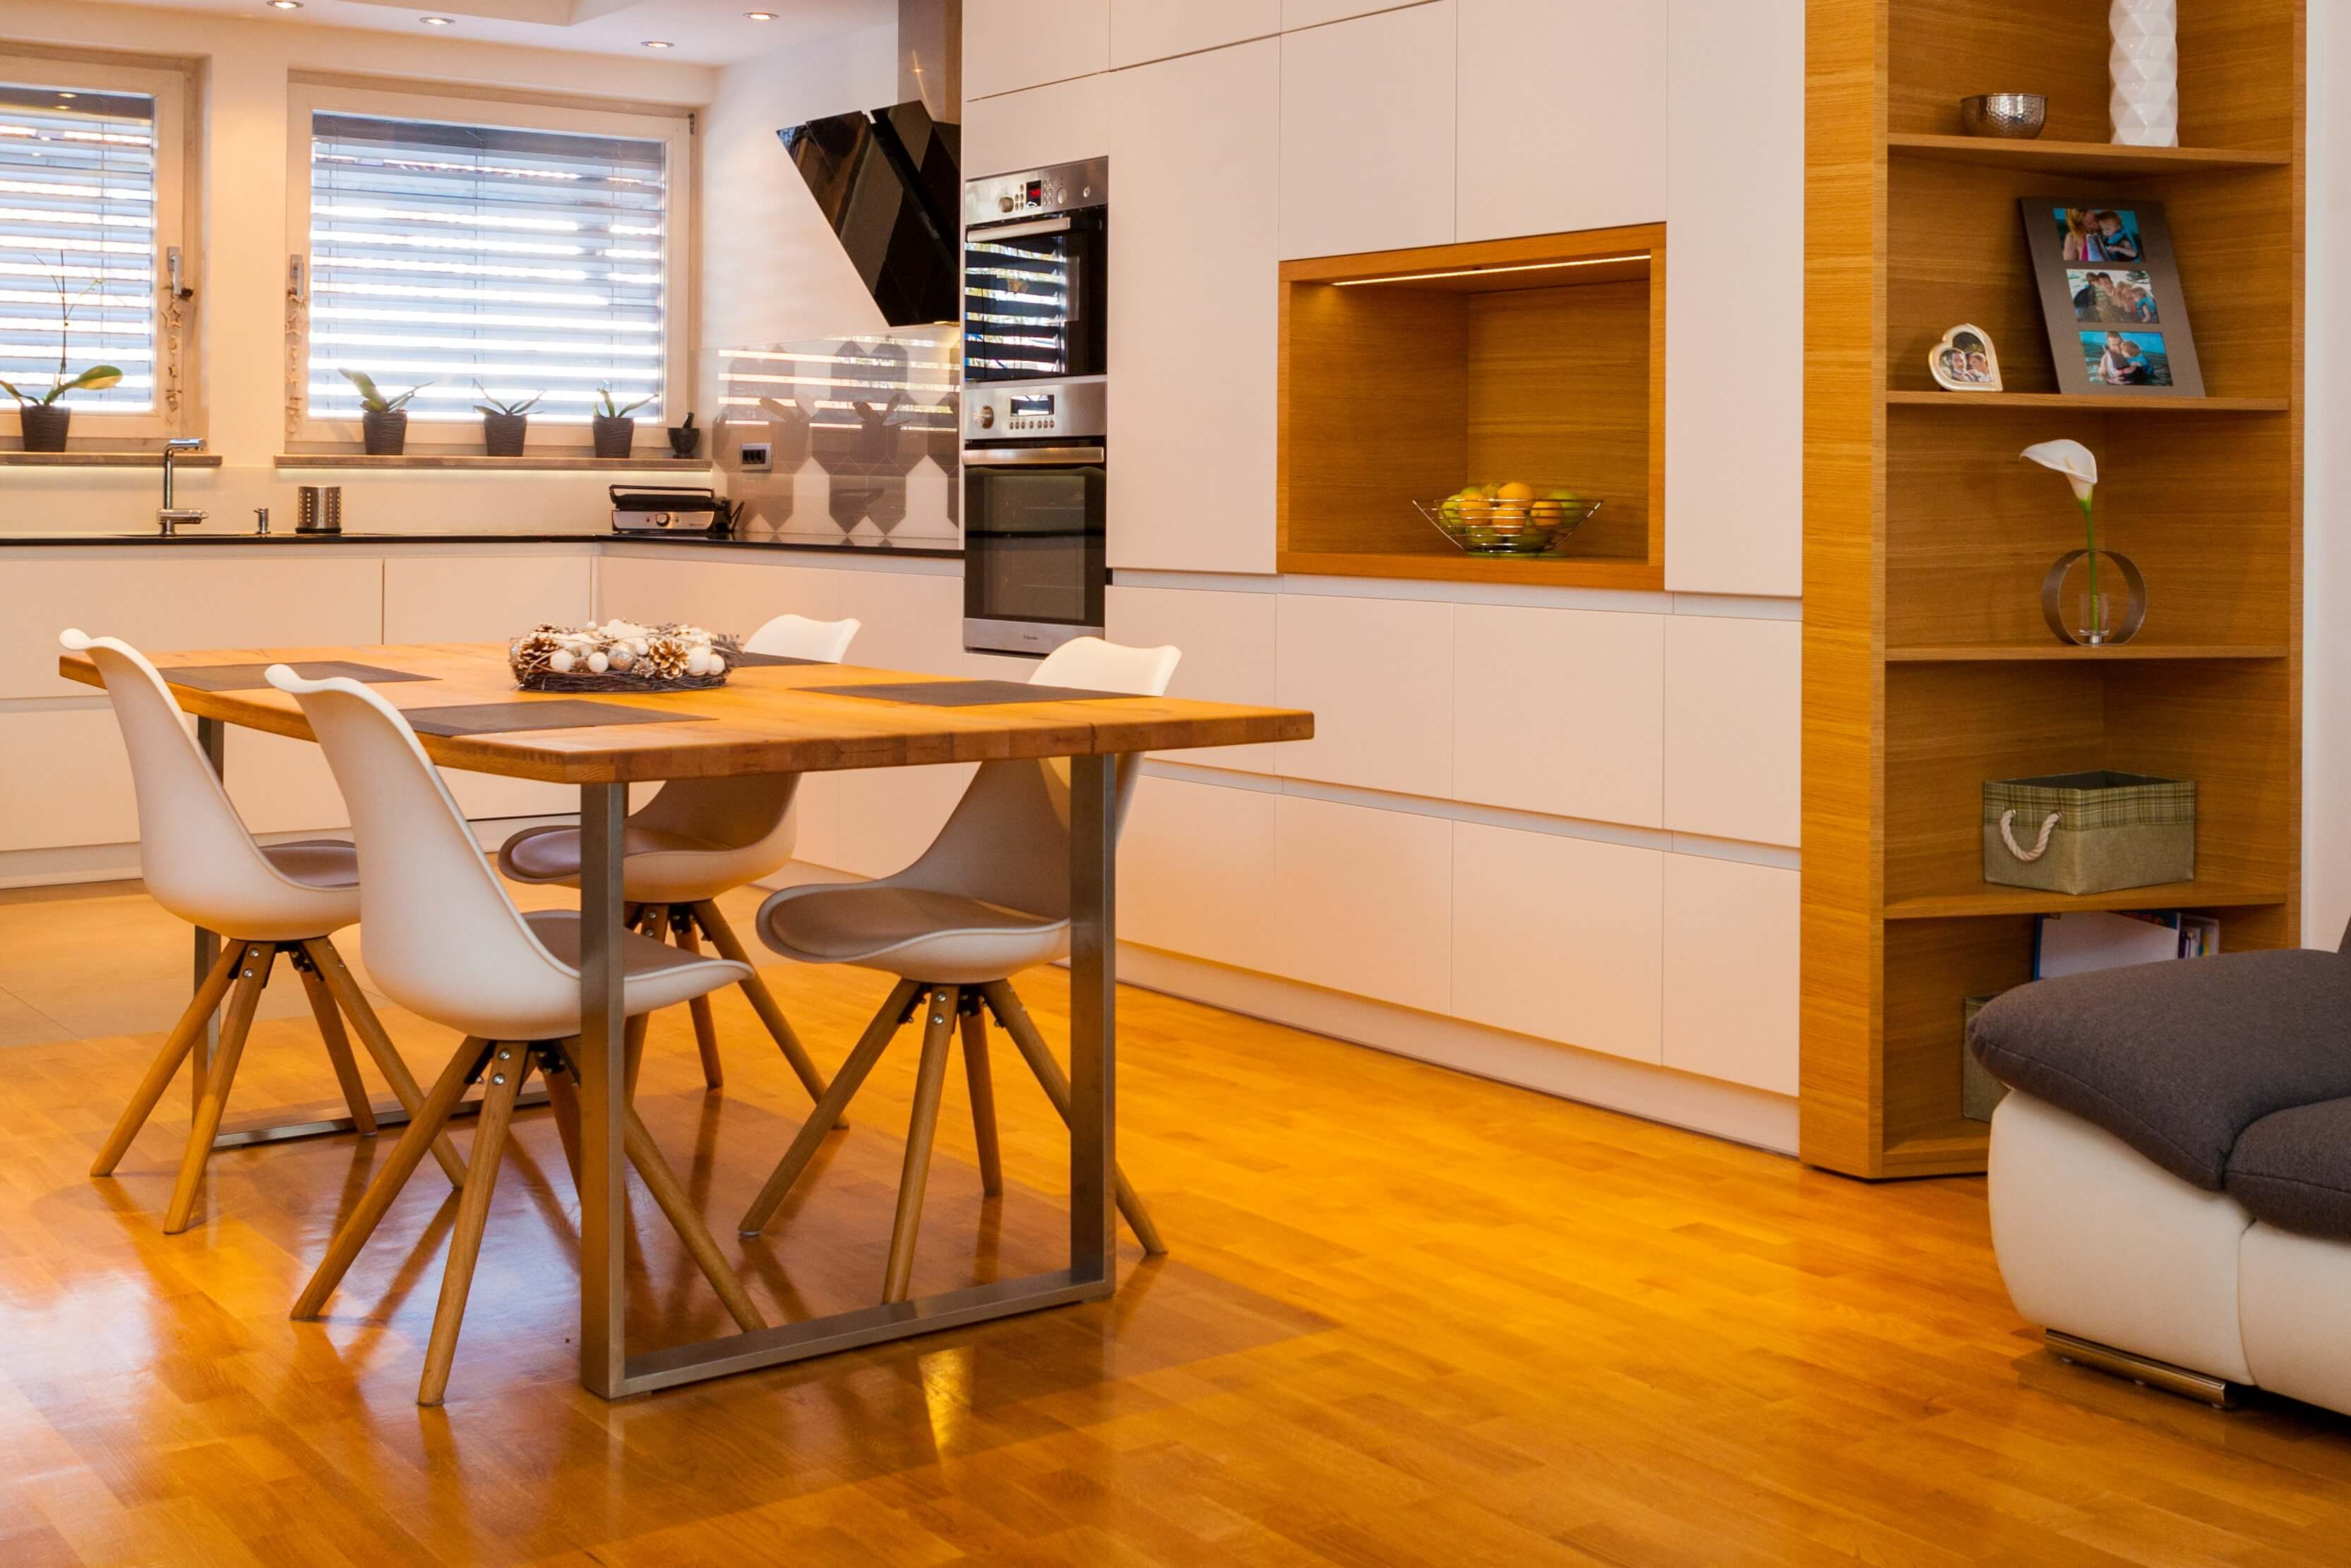 izdelava kuhinje po meri mizarstvo markelj. Black Bedroom Furniture Sets. Home Design Ideas